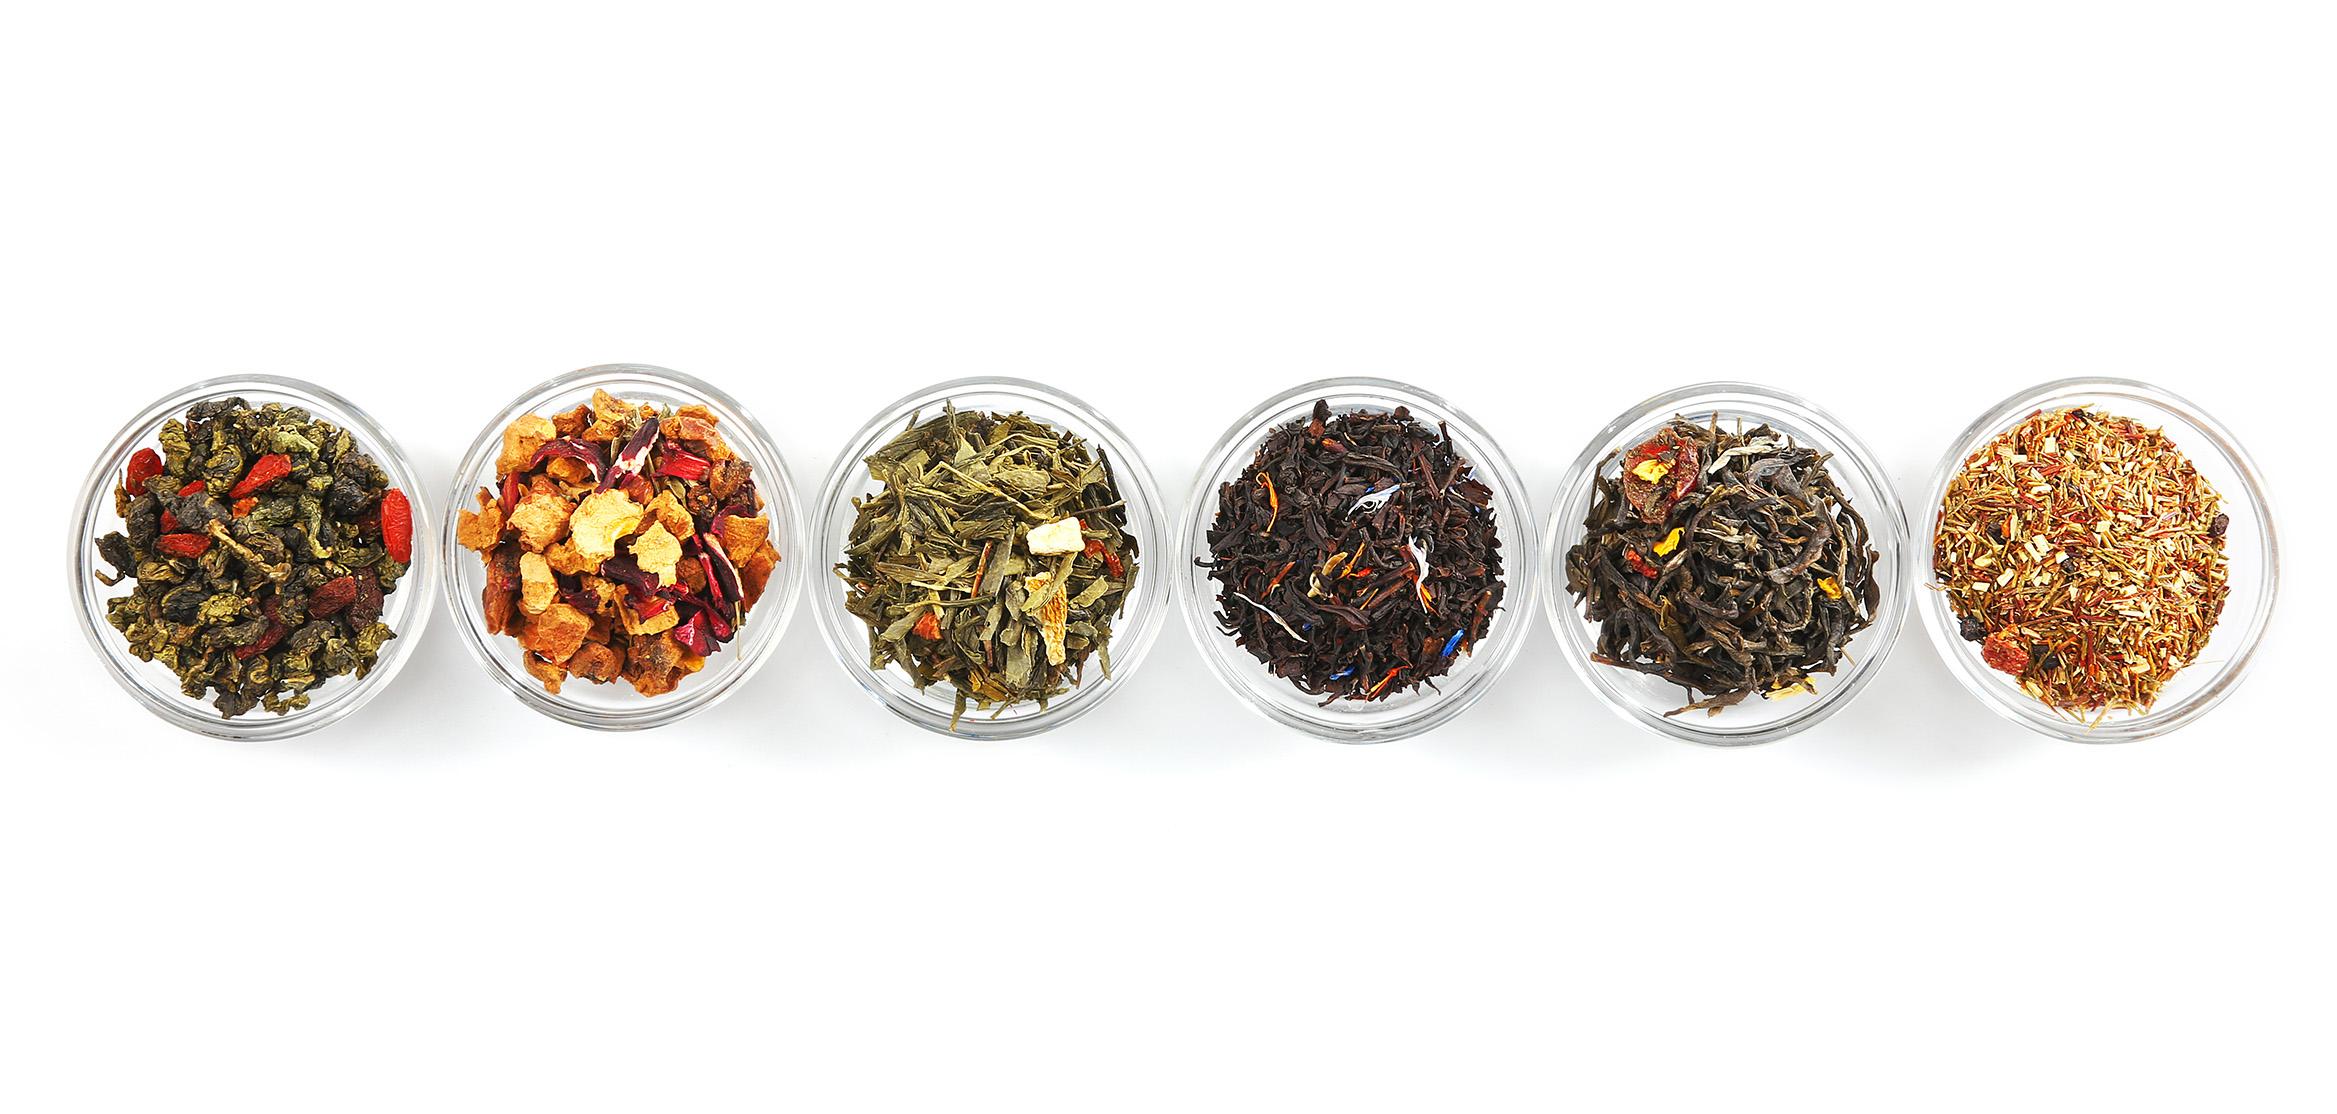 How to Brew Tea The Best Way?